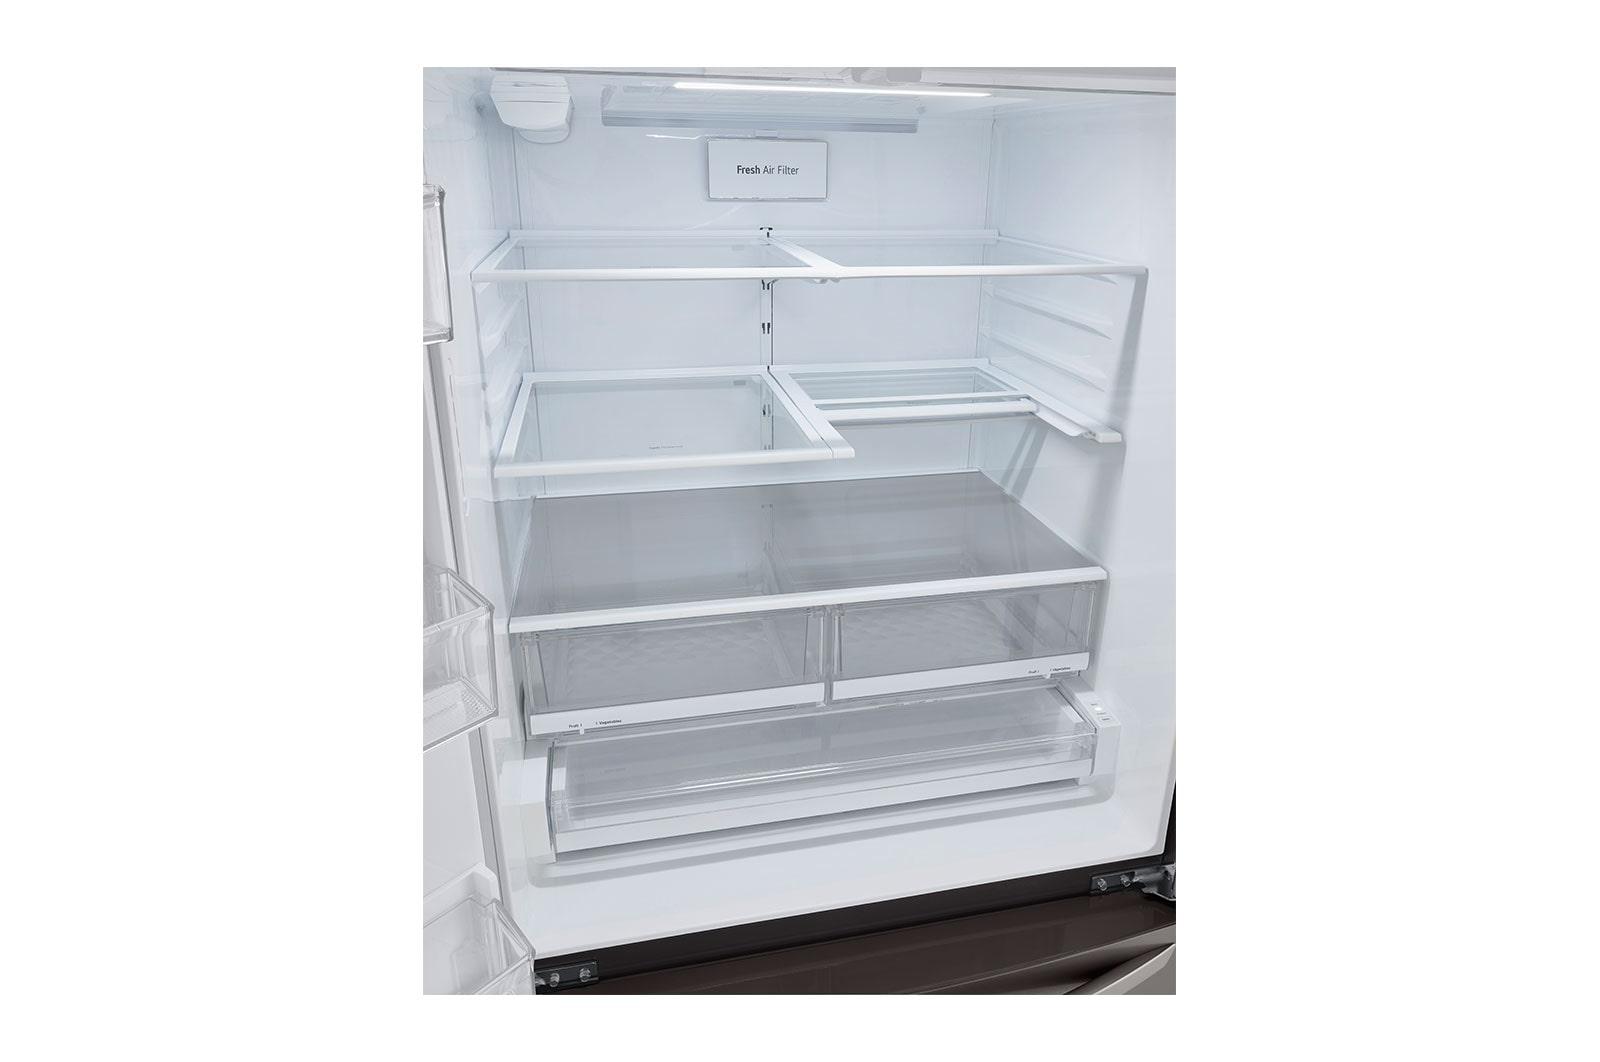 LG Product